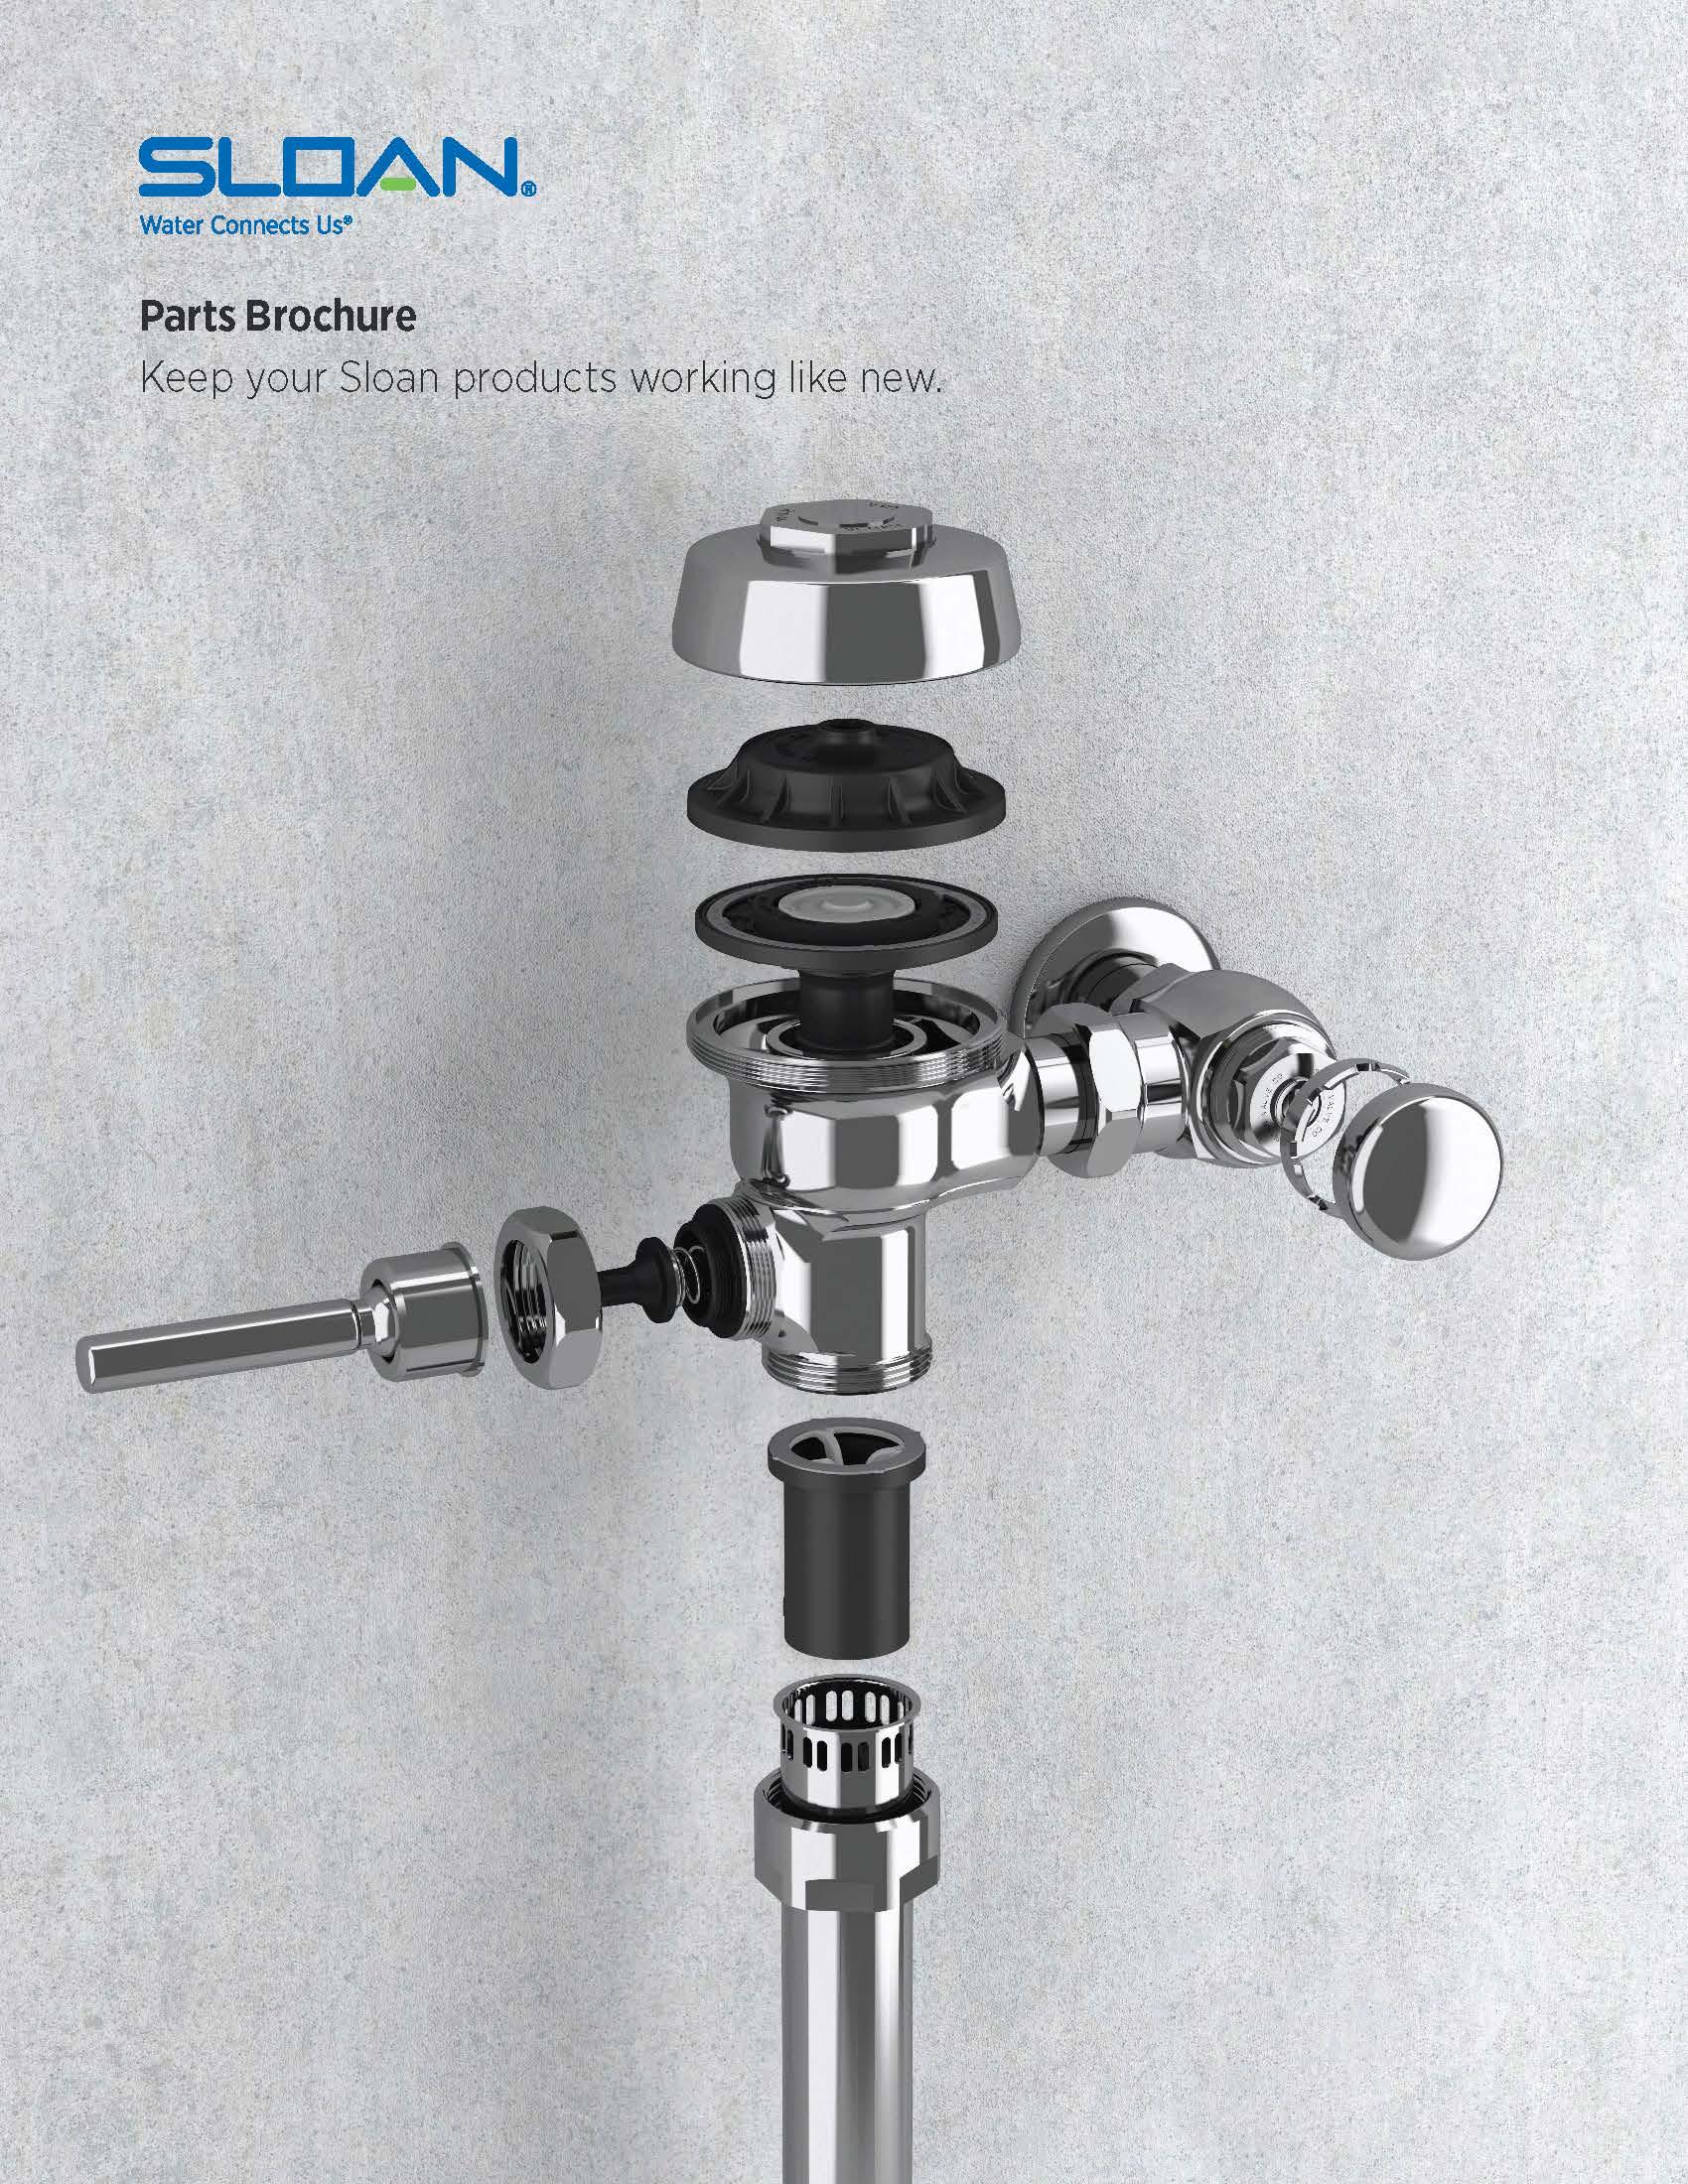 Parts-Brochure 1.jpg